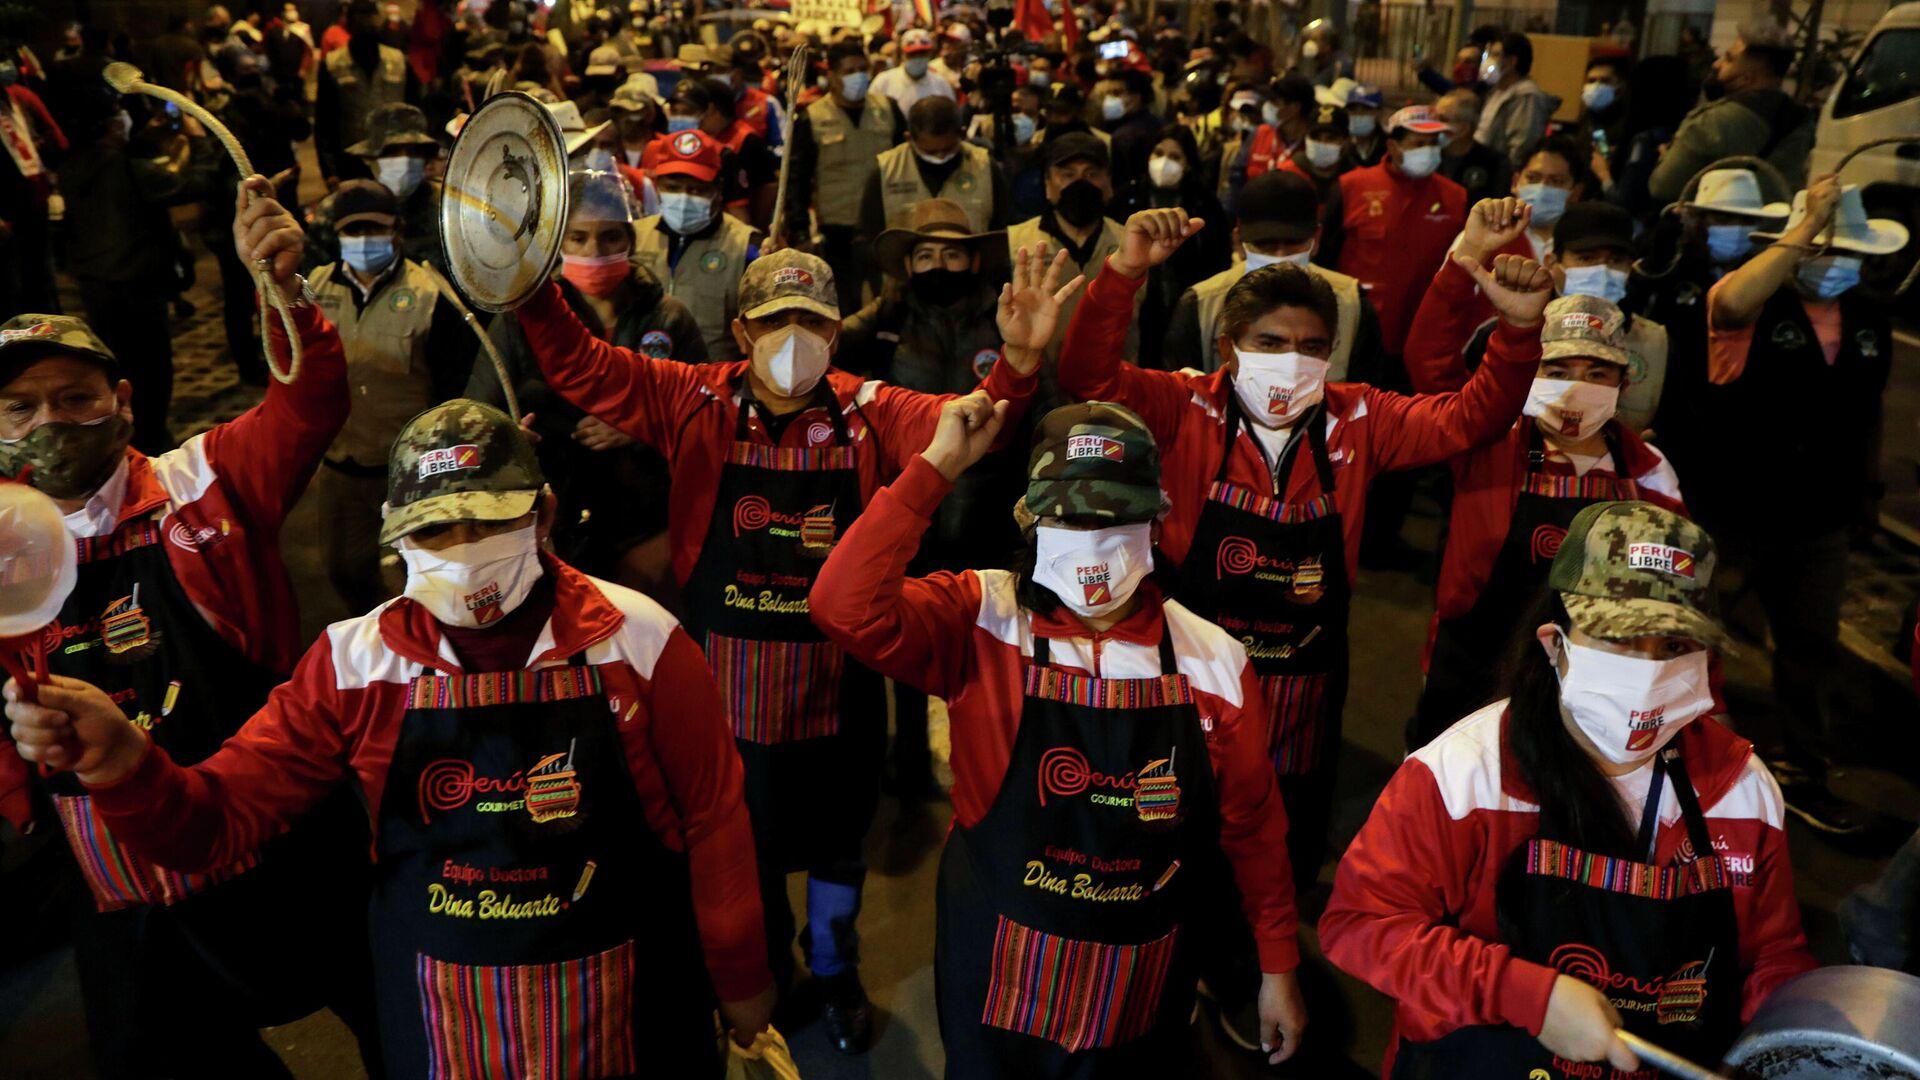 Manifestaciones en Perú - Sputnik Mundo, 1920, 30.06.2021